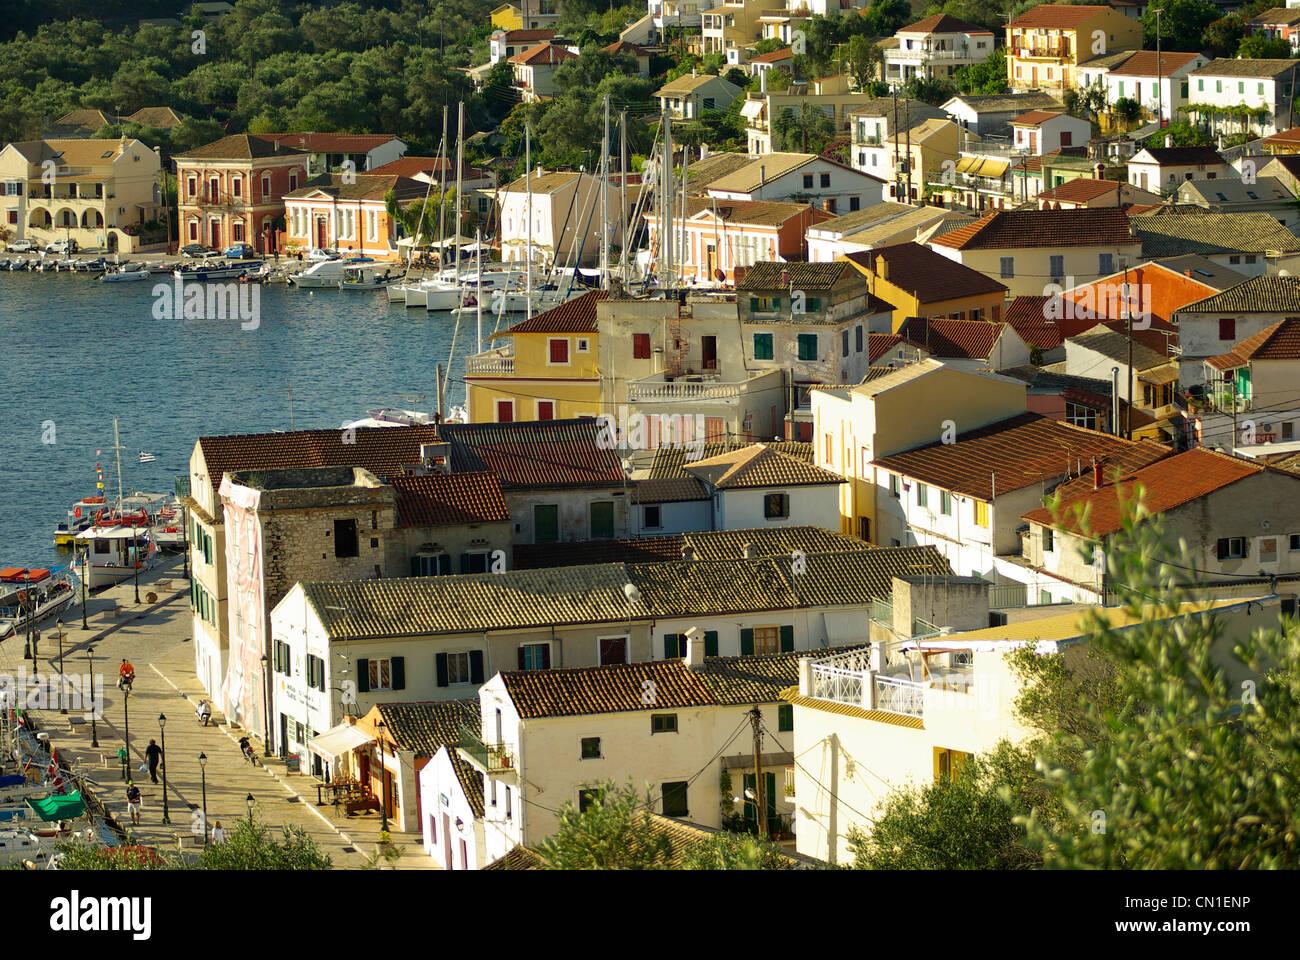 Gaios town, Paxos - Stock Image